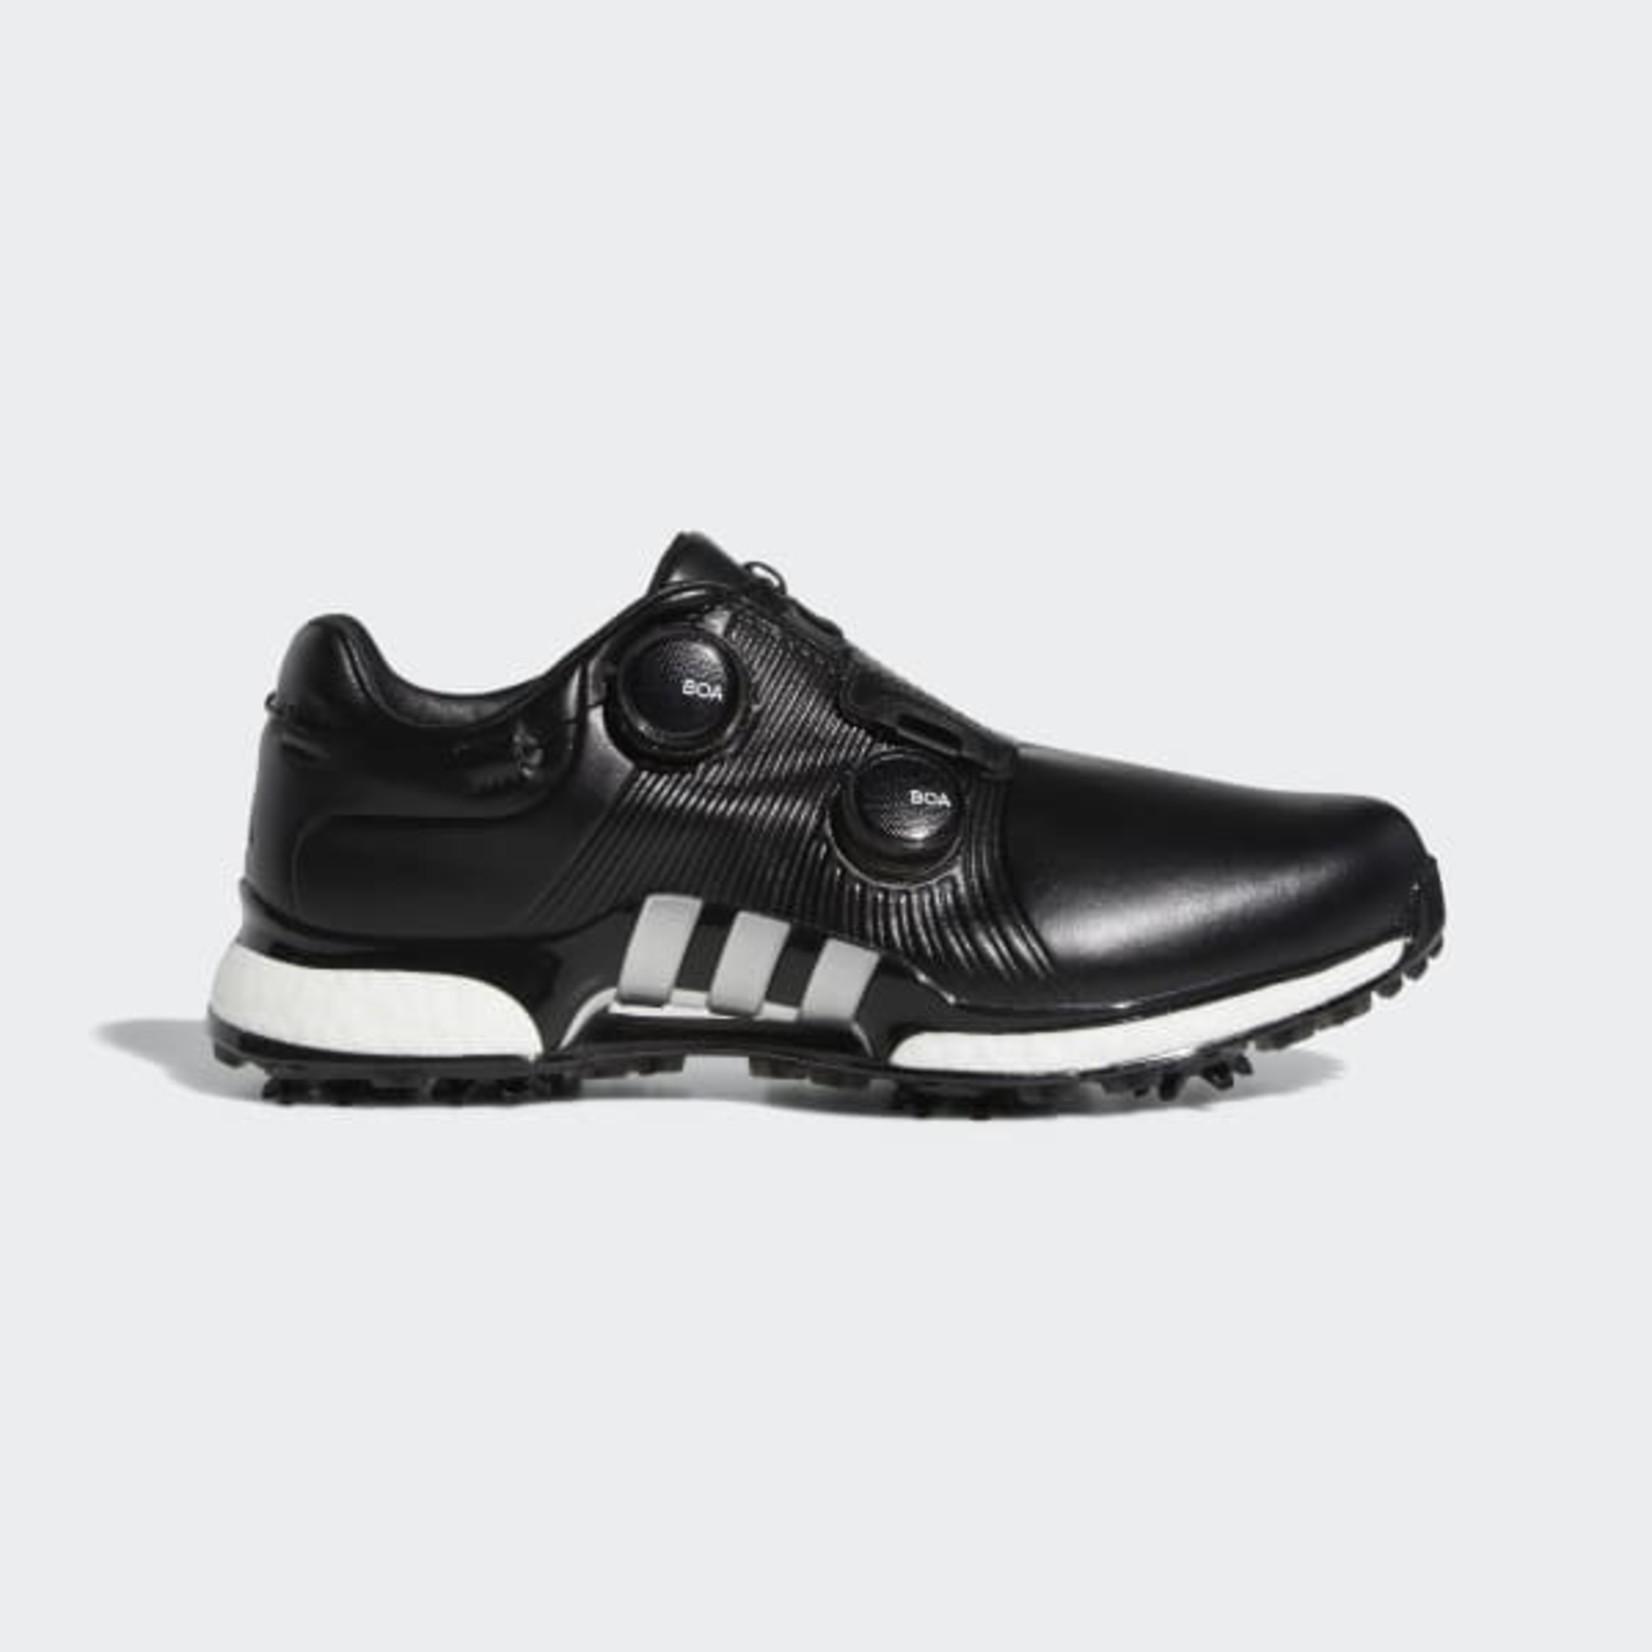 Adidas Adidas Mens Tour360 XT Twin BOA